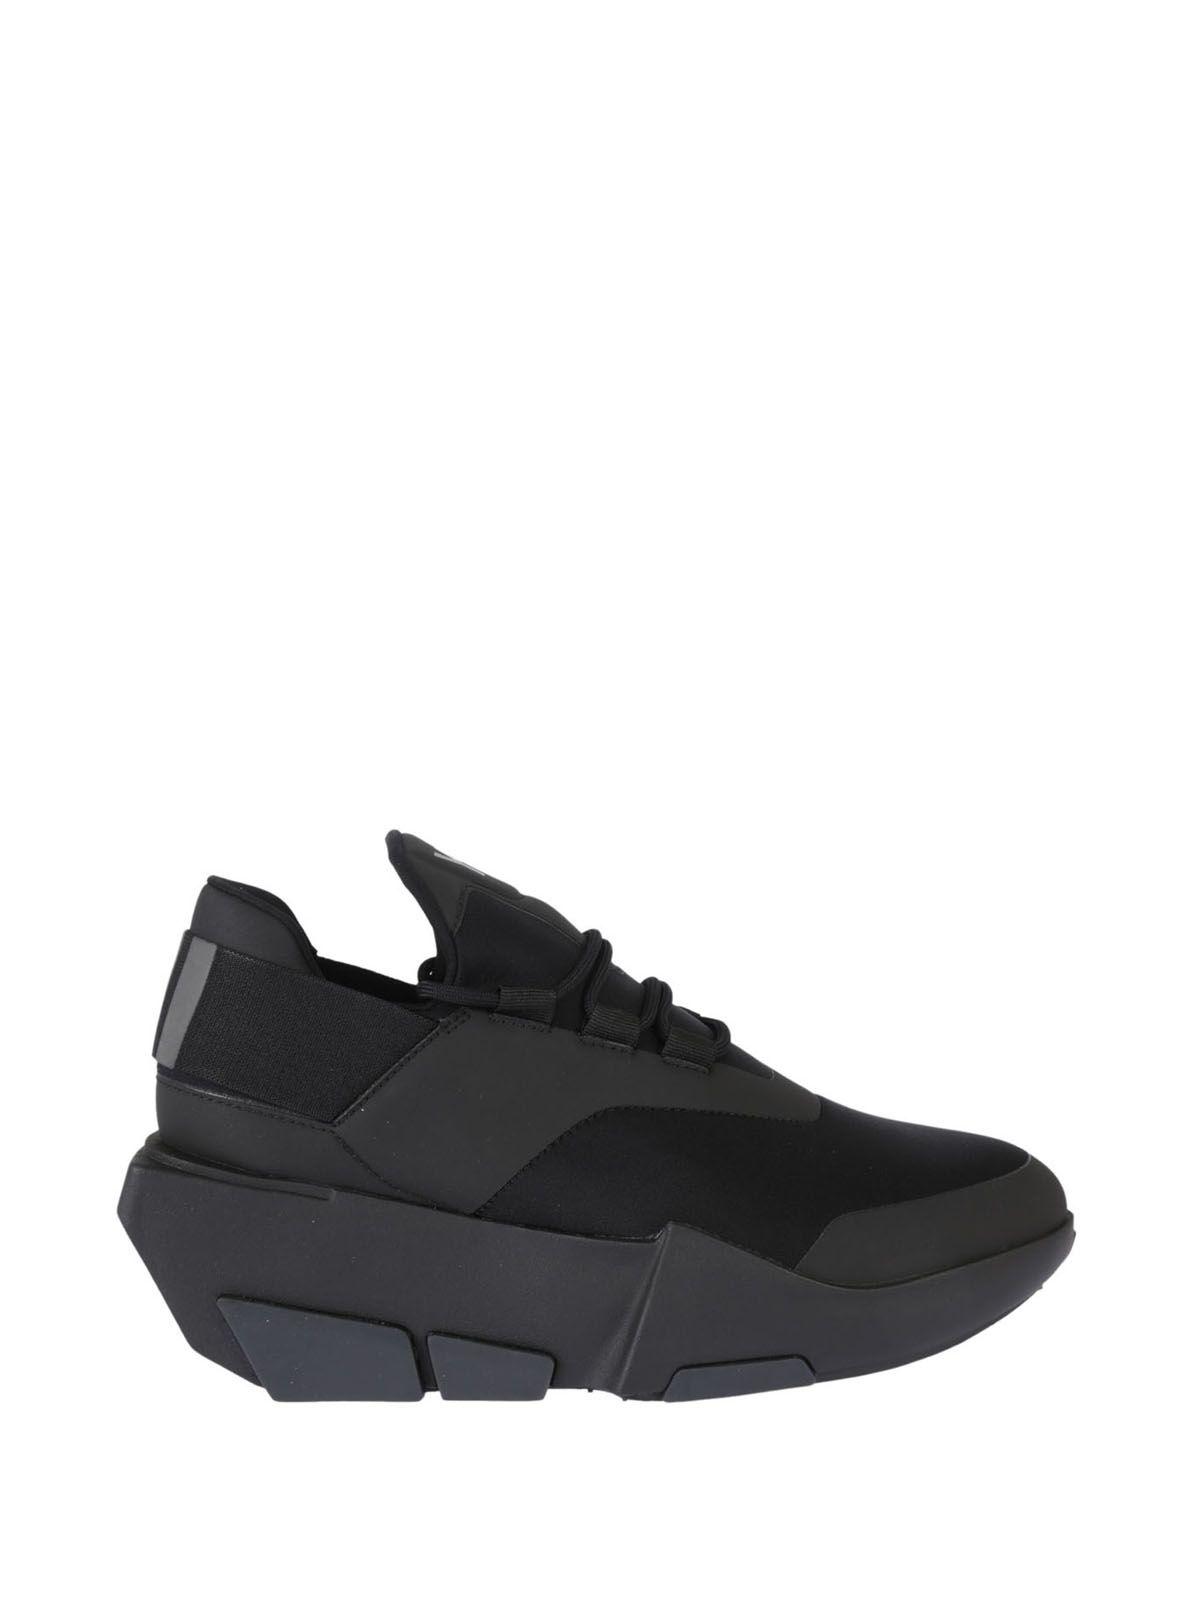 Y-3 Mira Hi-top Sneakers